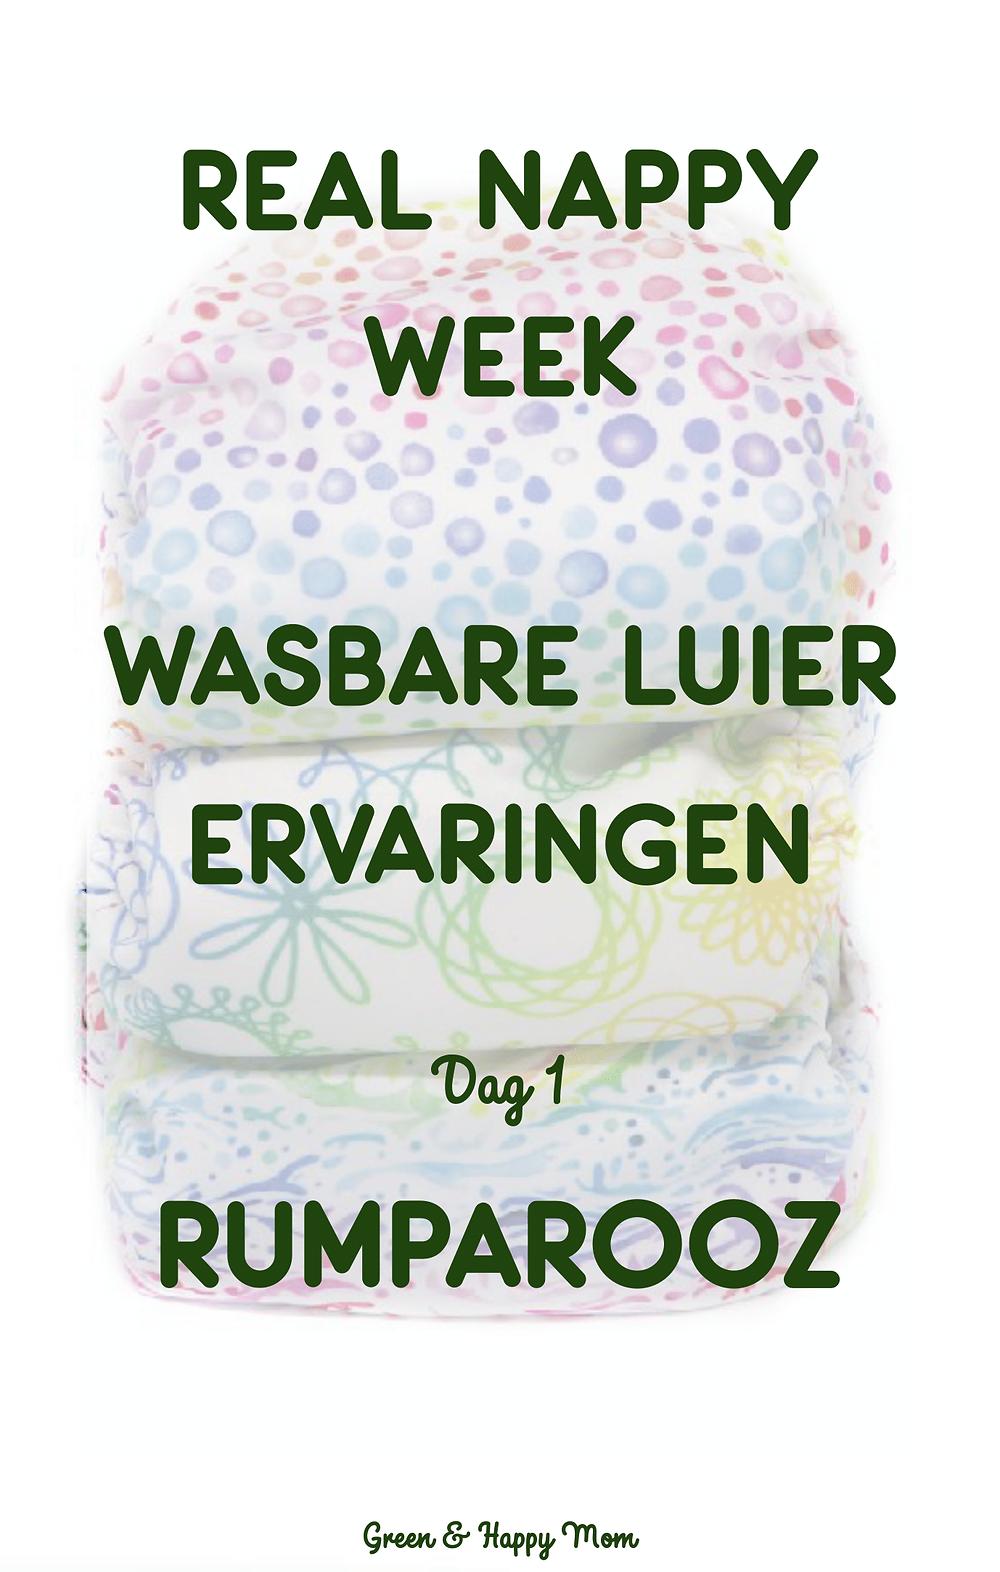 Wasbare luier ervaring - Rumparooz